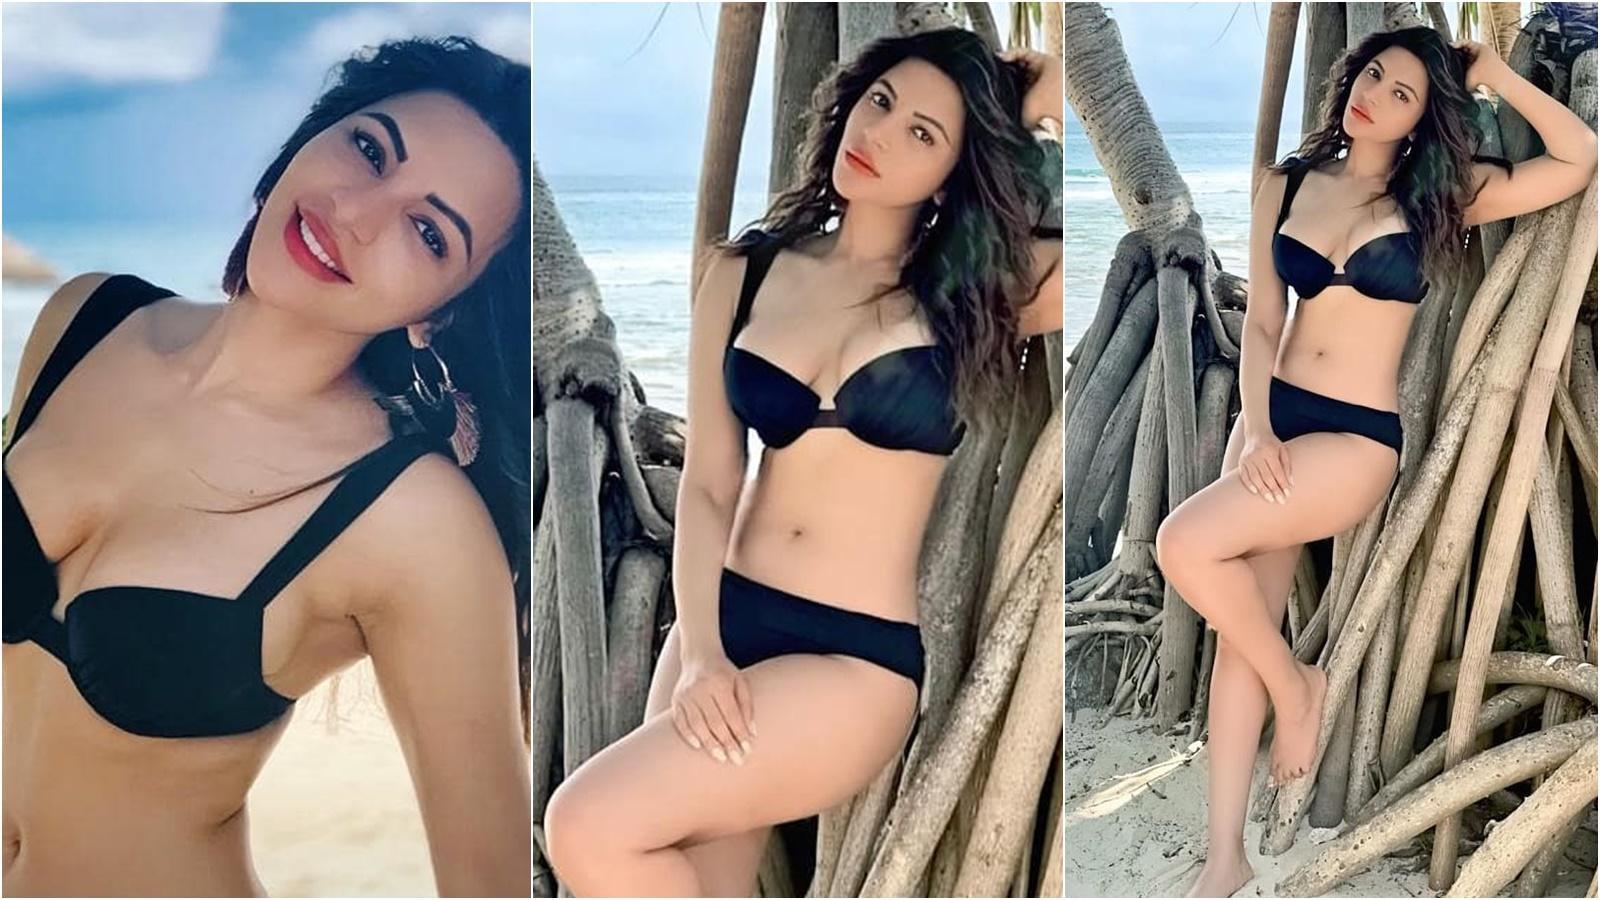 Shama Sikander flaunts her envious body in smouldering black bikini